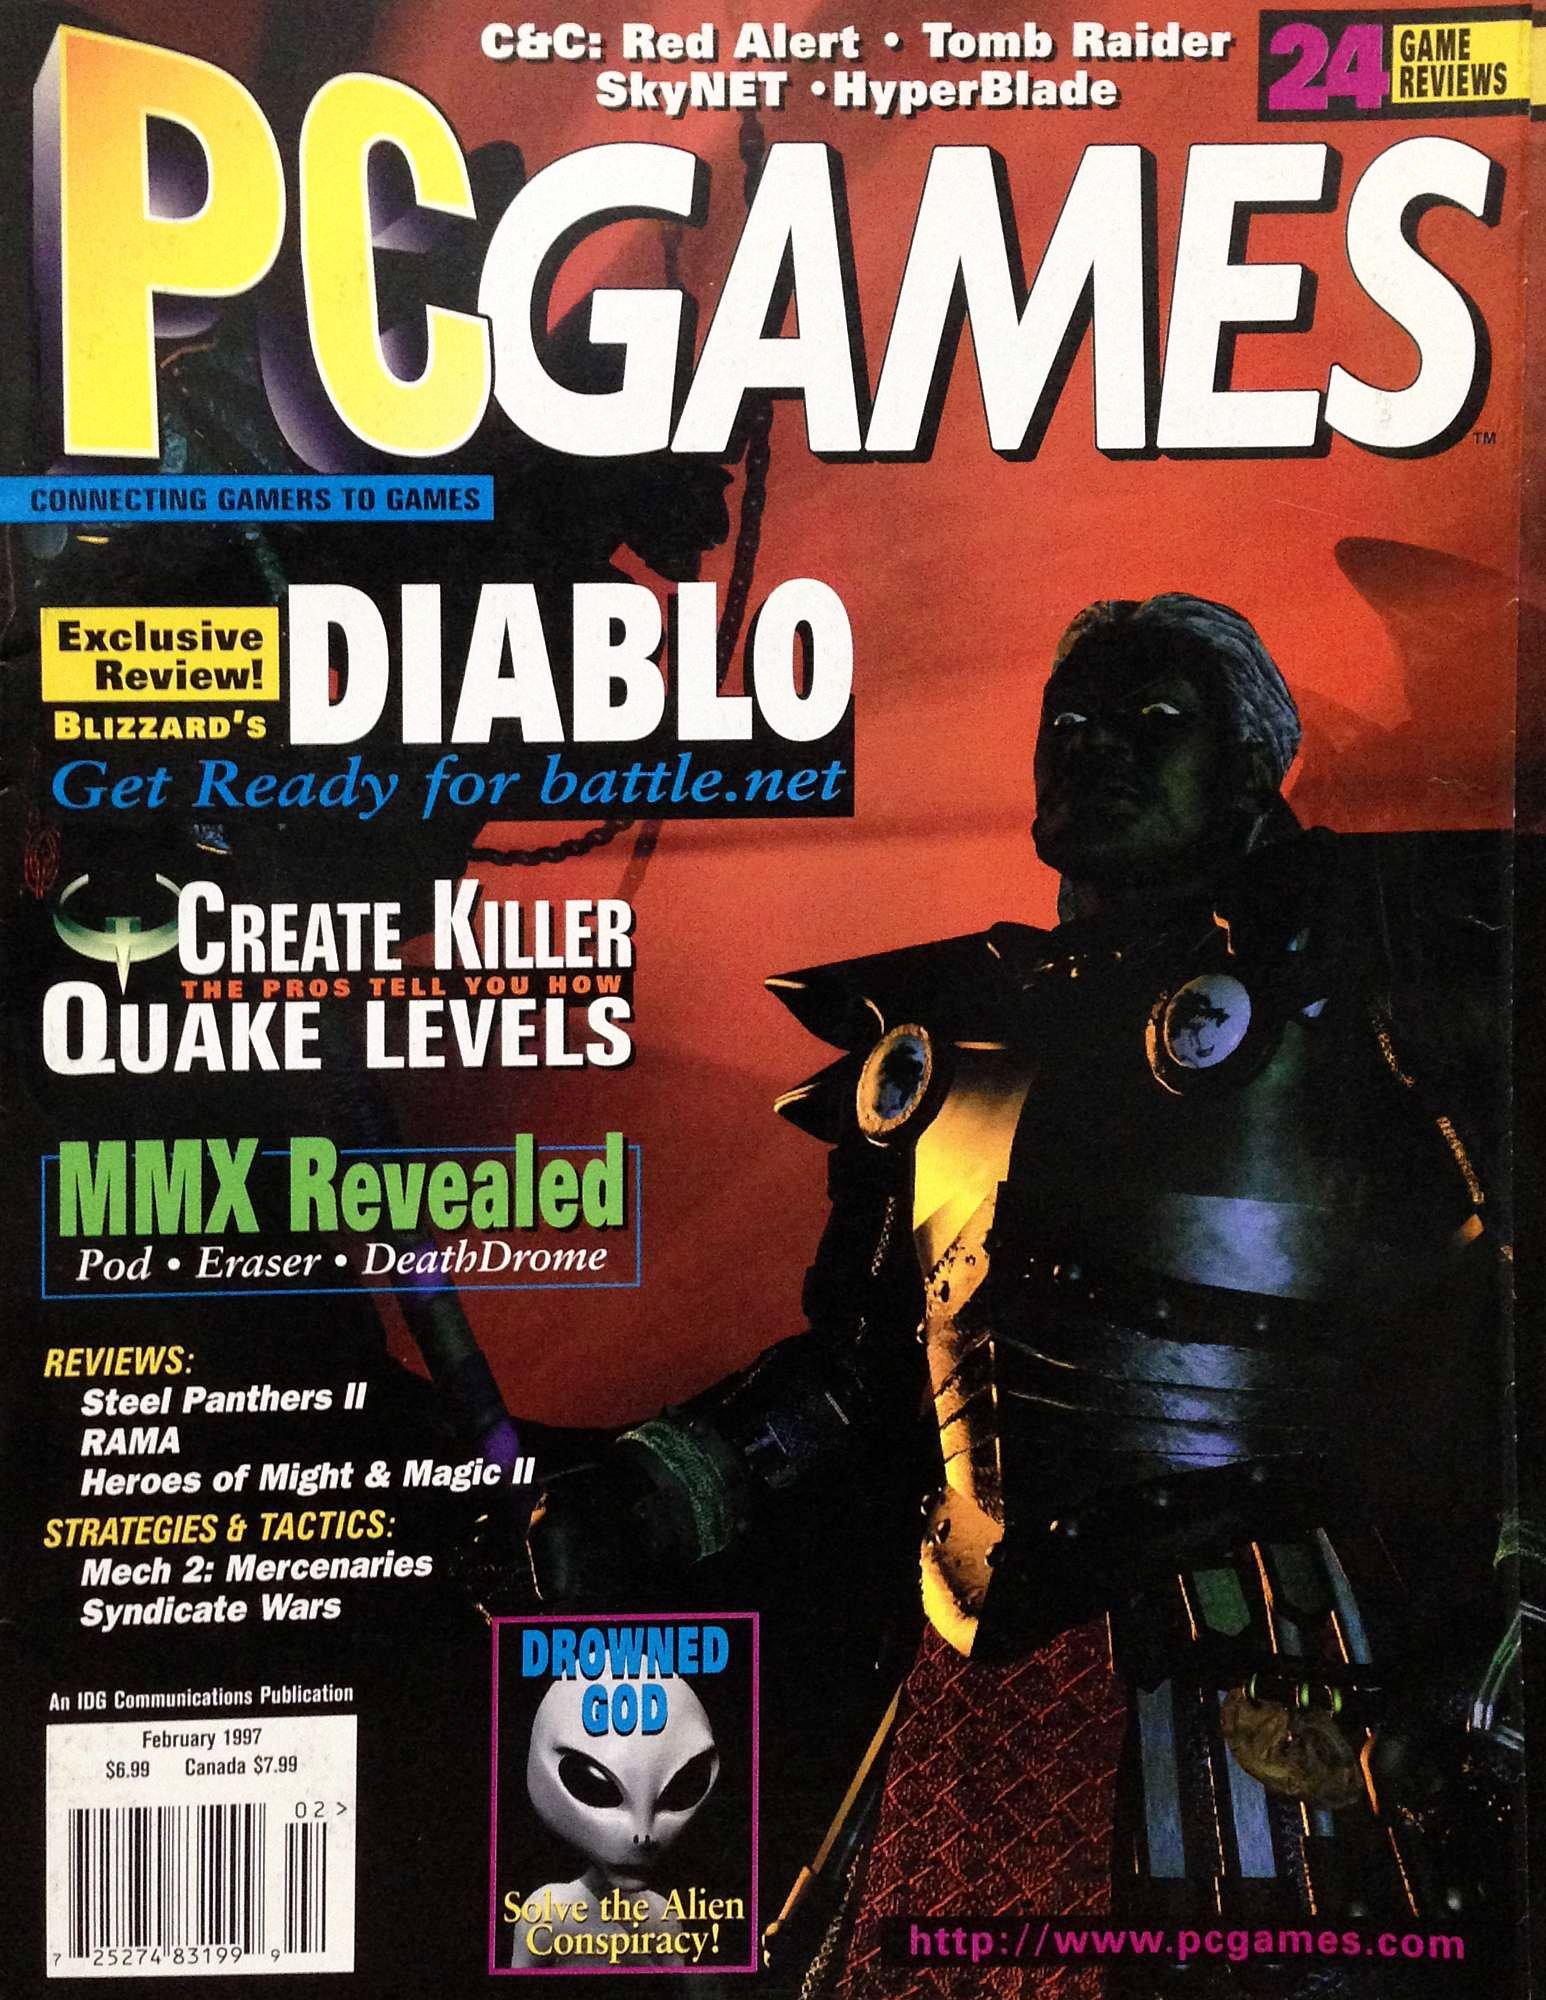 PC Games Vol. 04 No. 02 (February 1997)